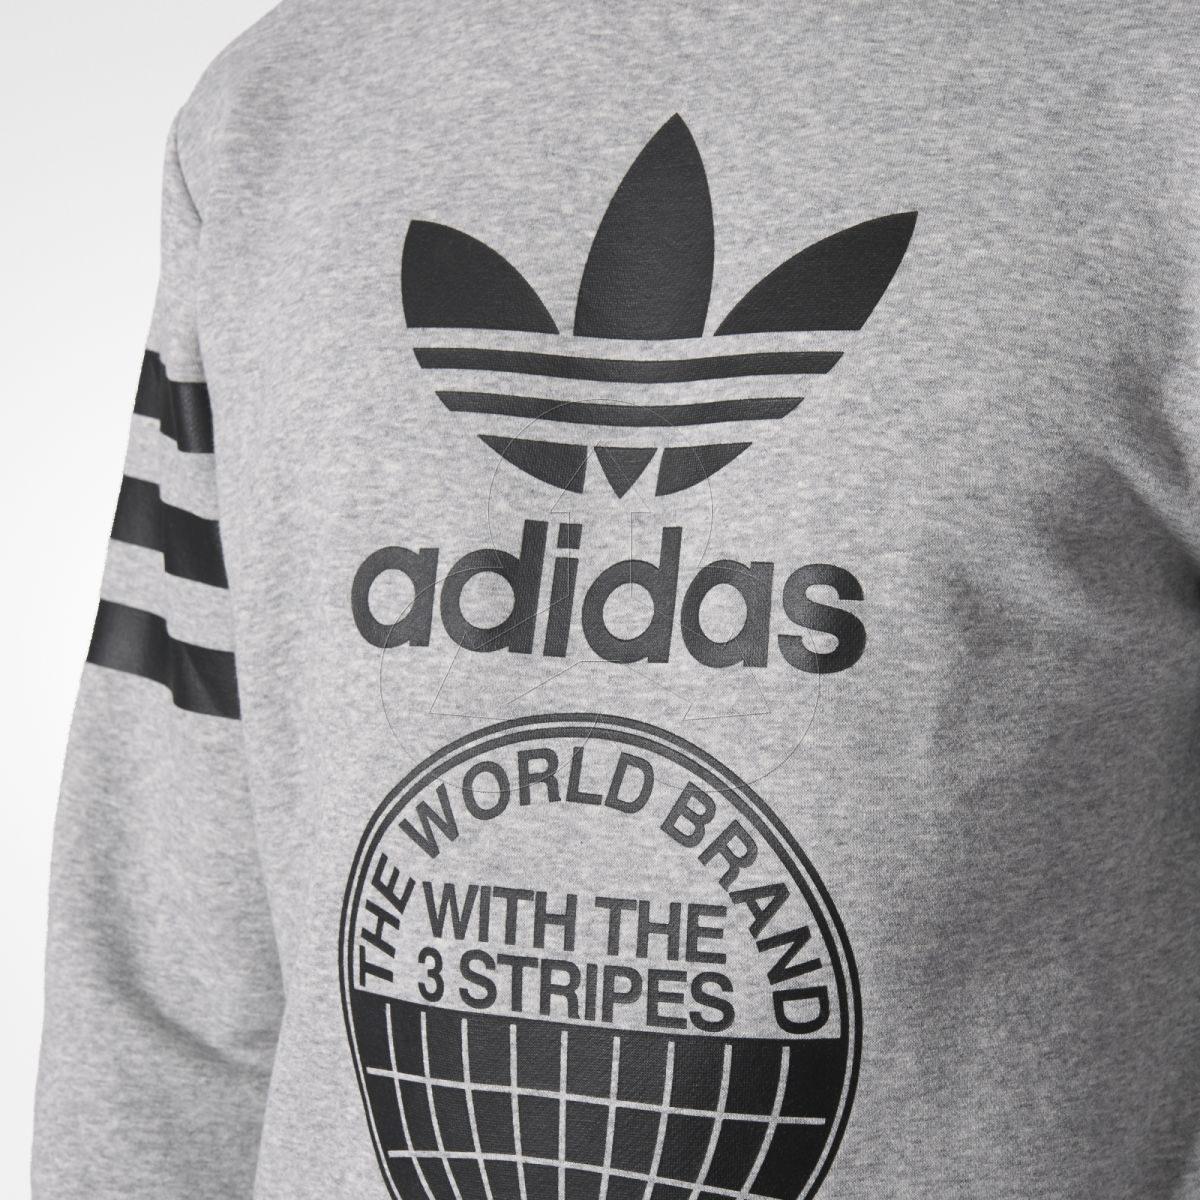 En Sudadera 899 Street Graphic Casual Adidas Urbana Originals Qoyxw0n 00 YY8B7g